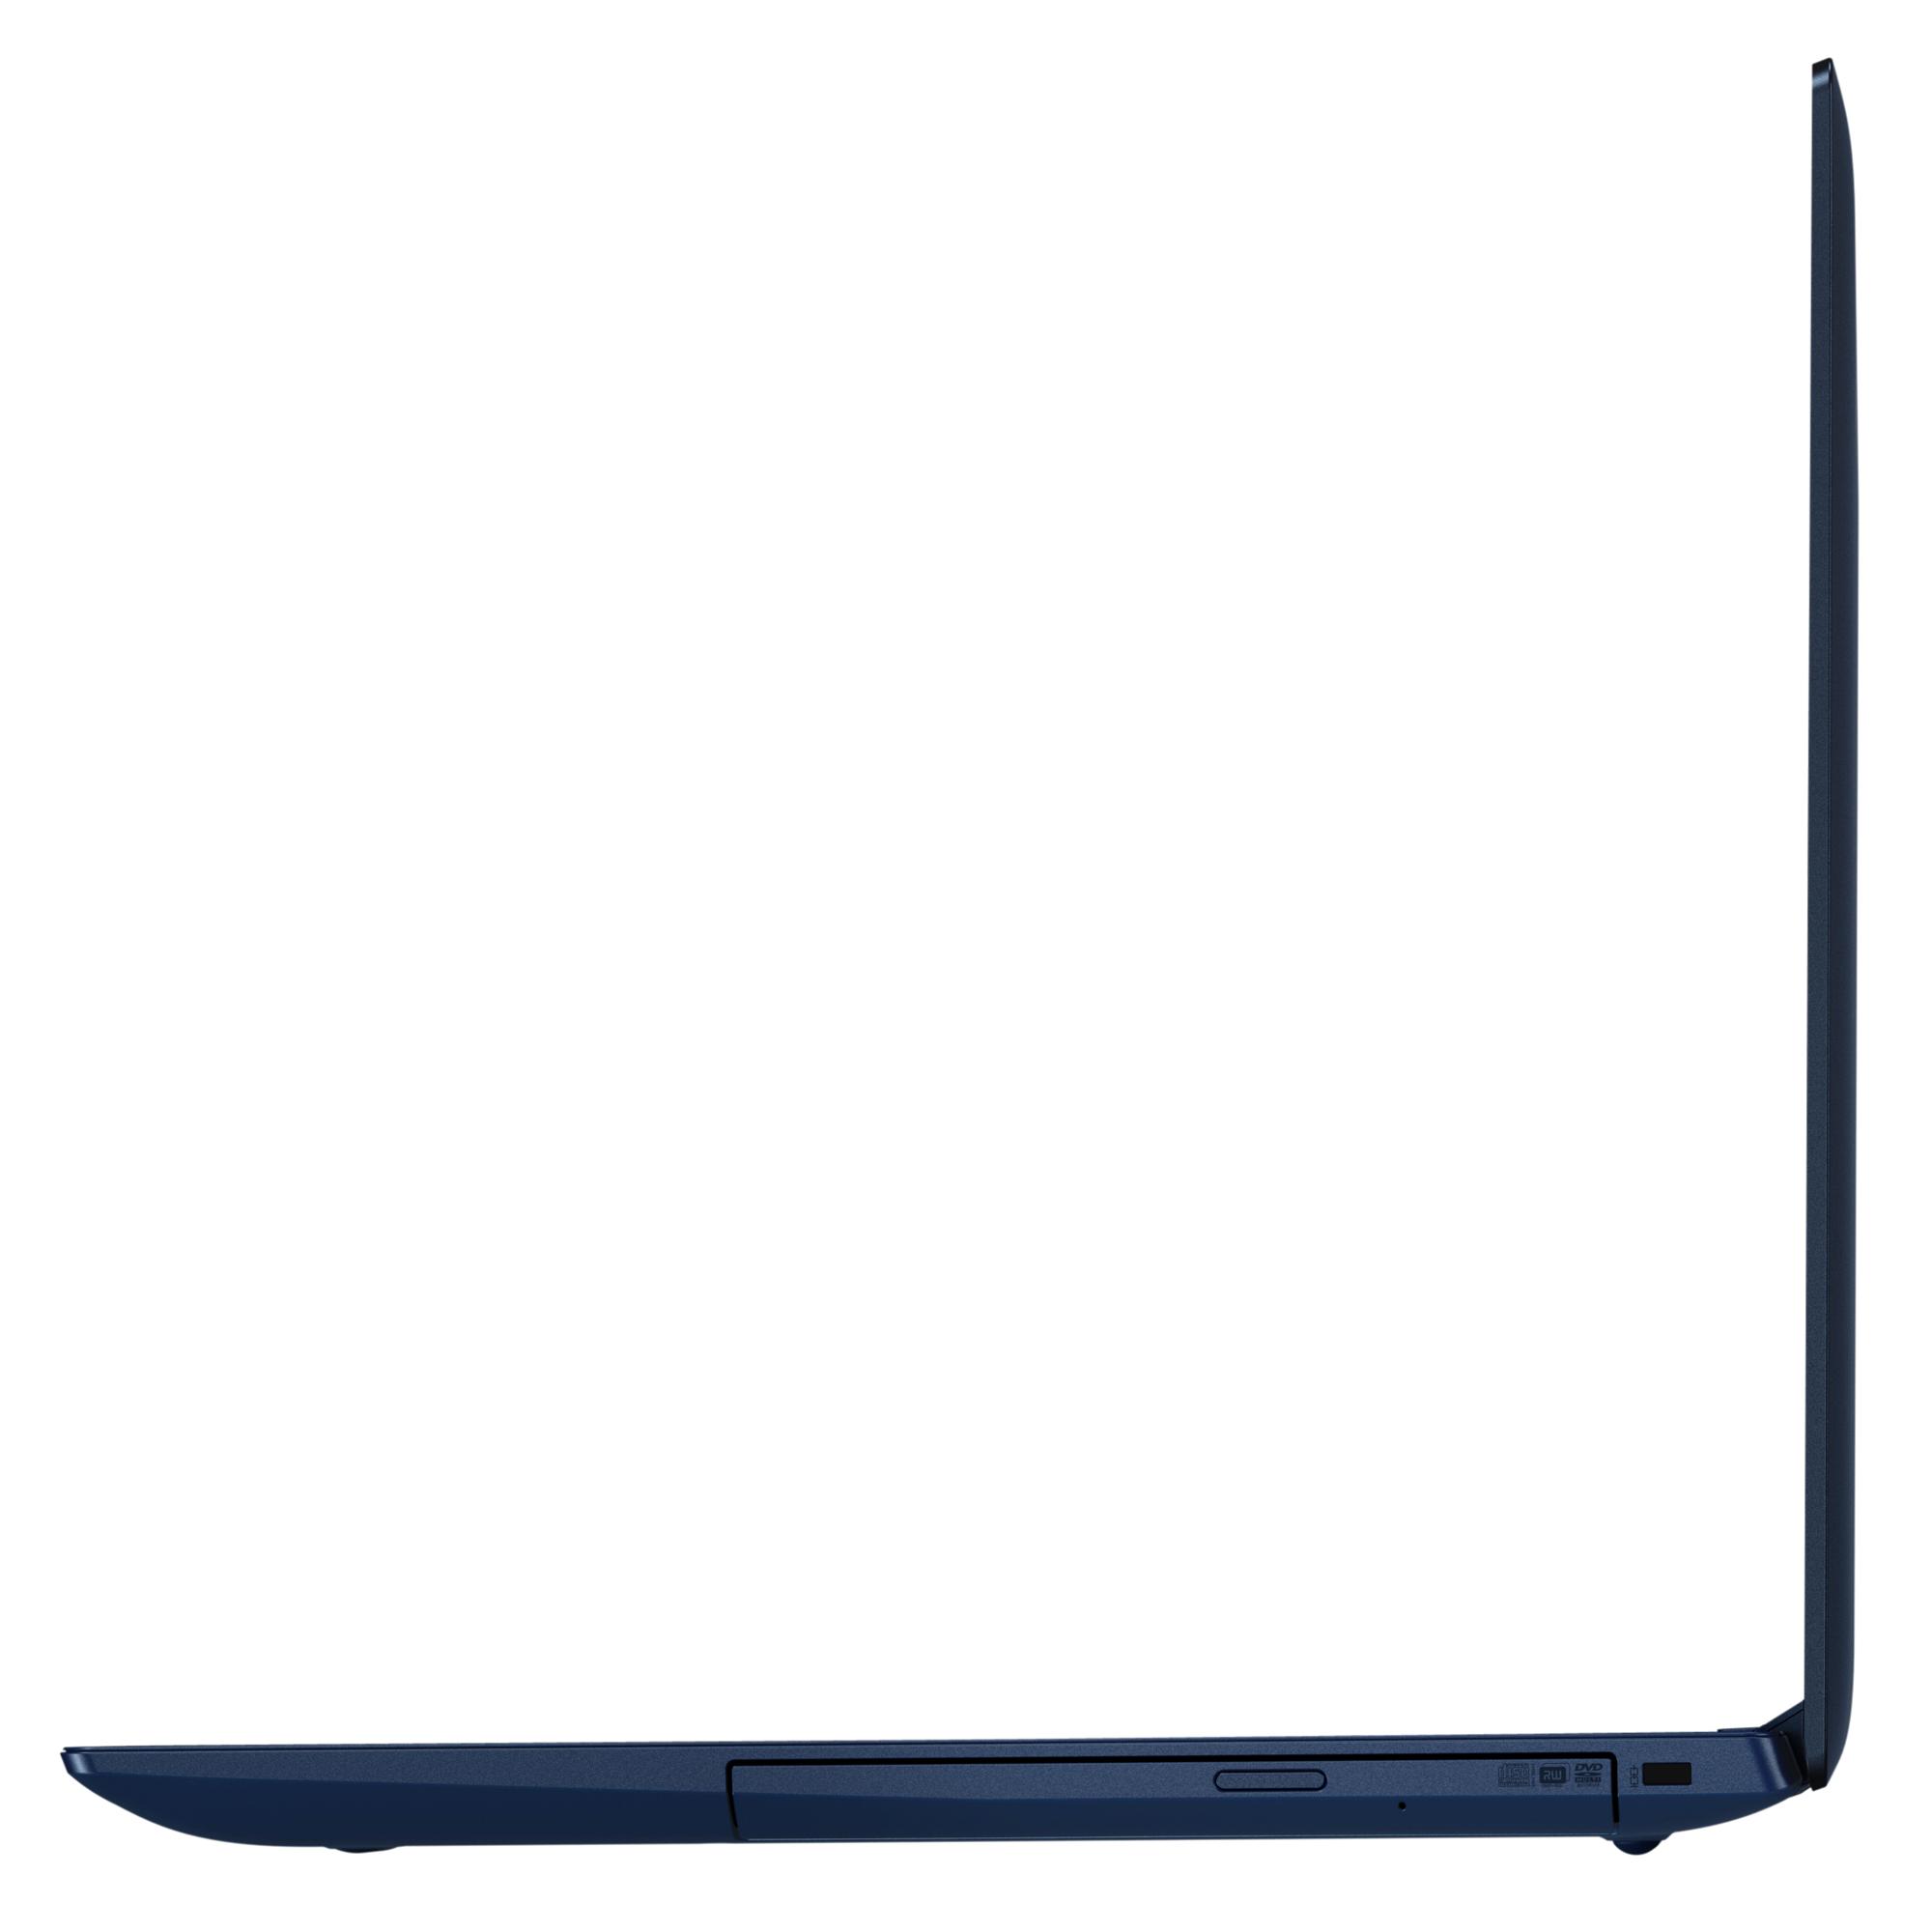 Фото  Ноутбук Lenovo ideapad 330-15 Midnight Blue (81DC00RGRA)